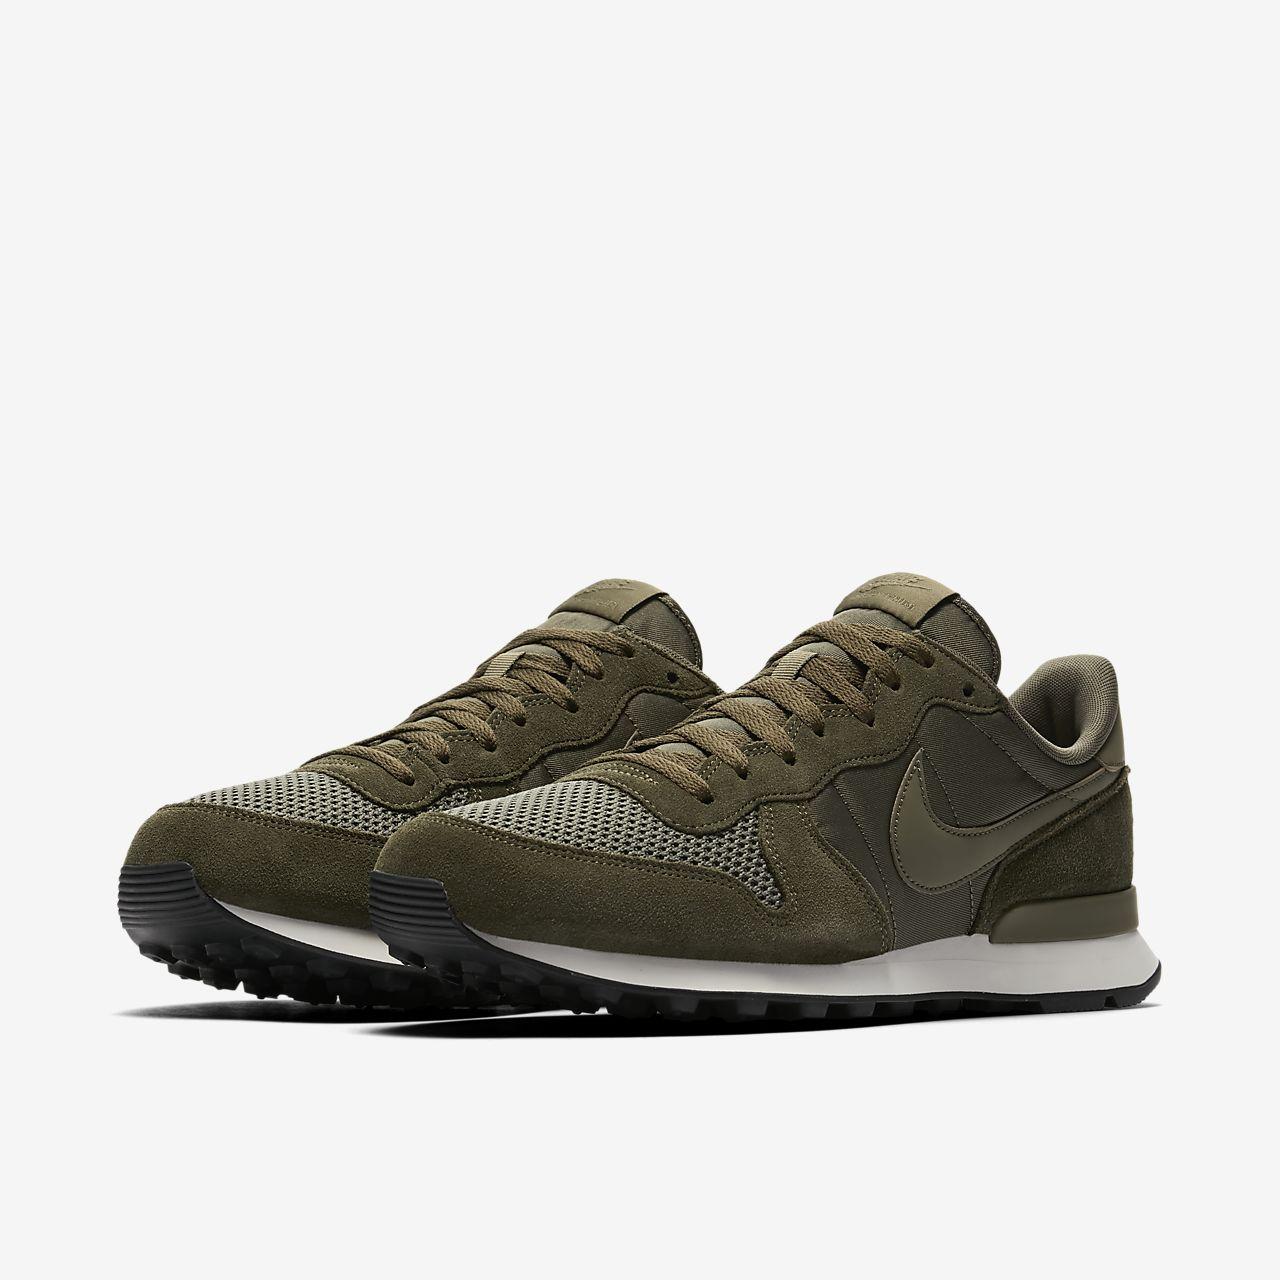 Chaussure Nike Internationalist SE pour LU LU pour ca10fa